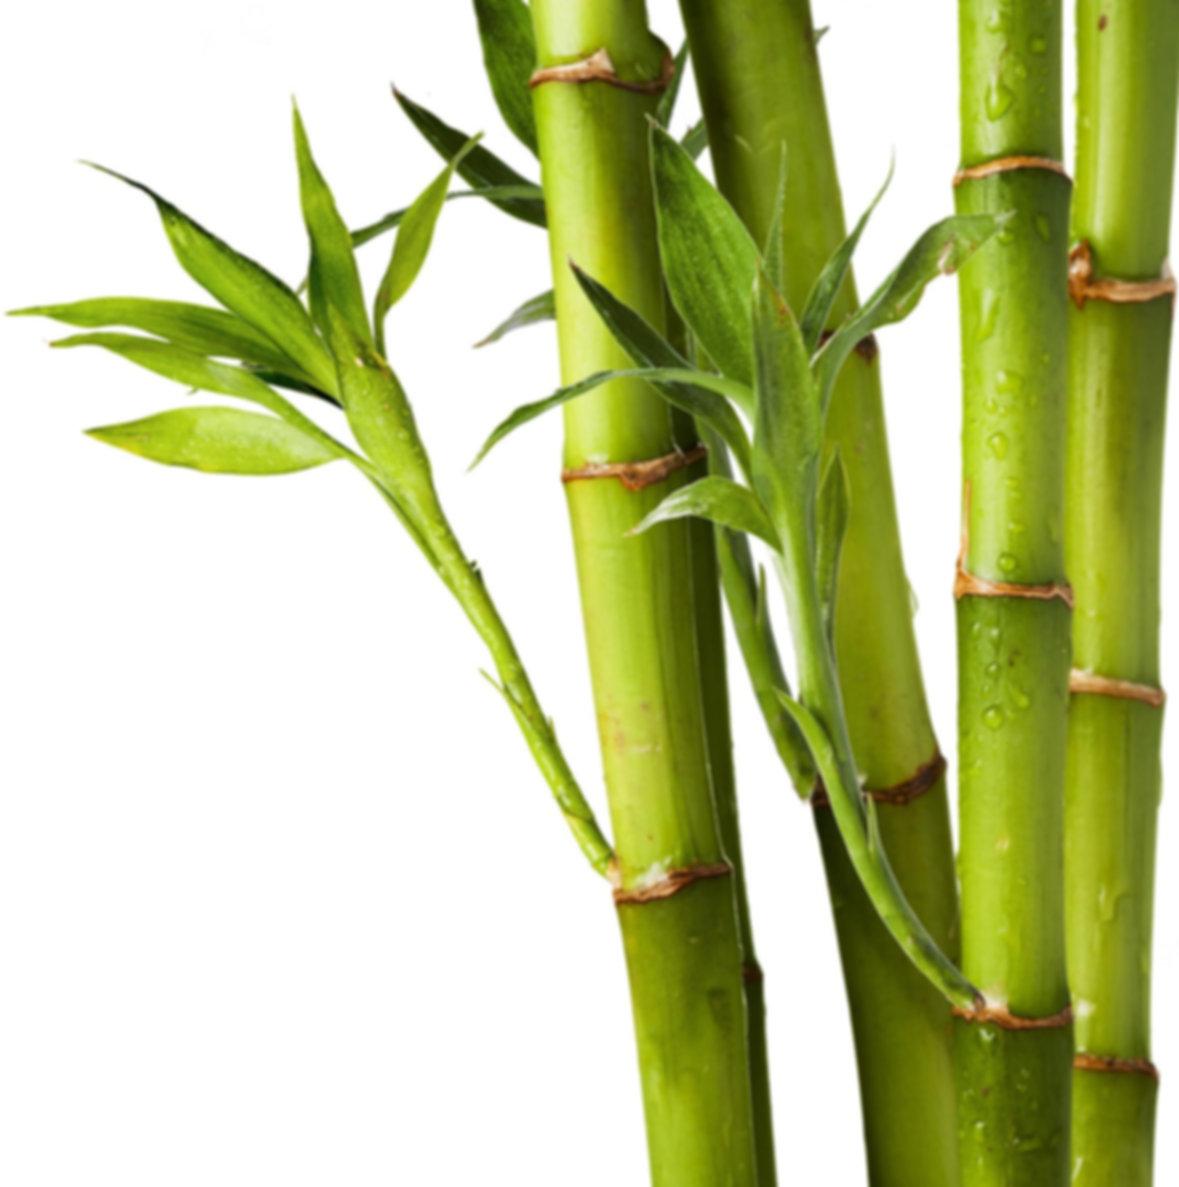 Bamboo.jpg 2015-12-3-19:15:9